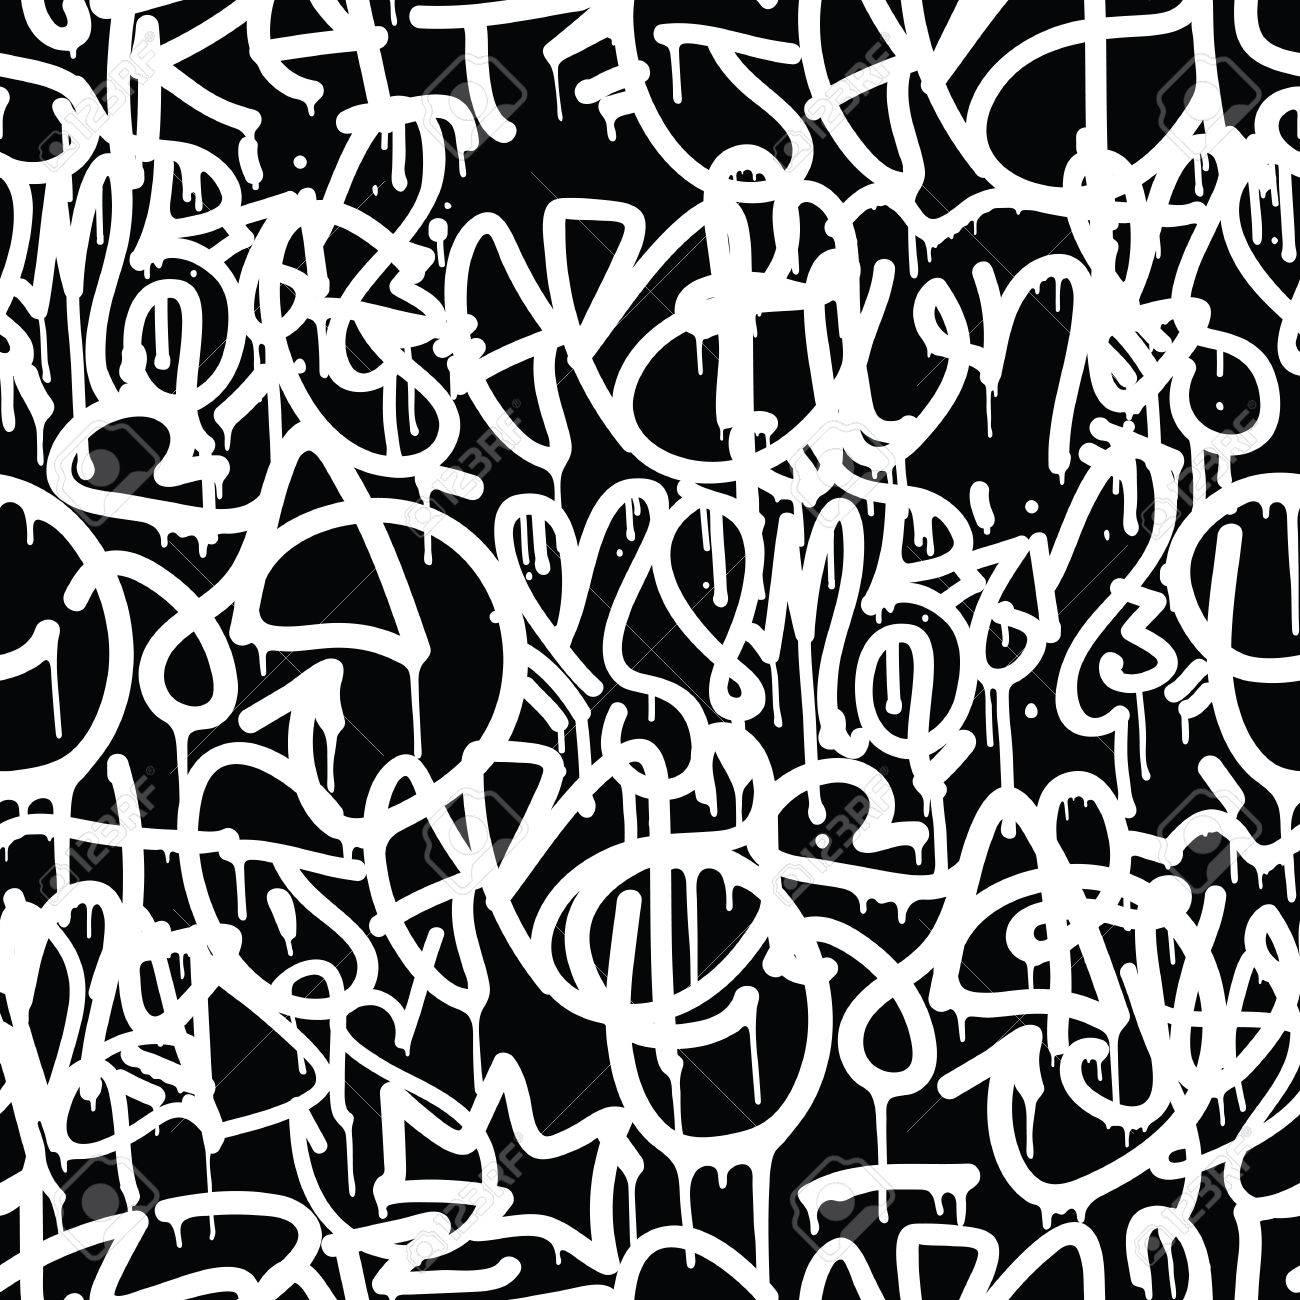 Graffiti background seamless pattern vector tags writing graffiti hand style old school